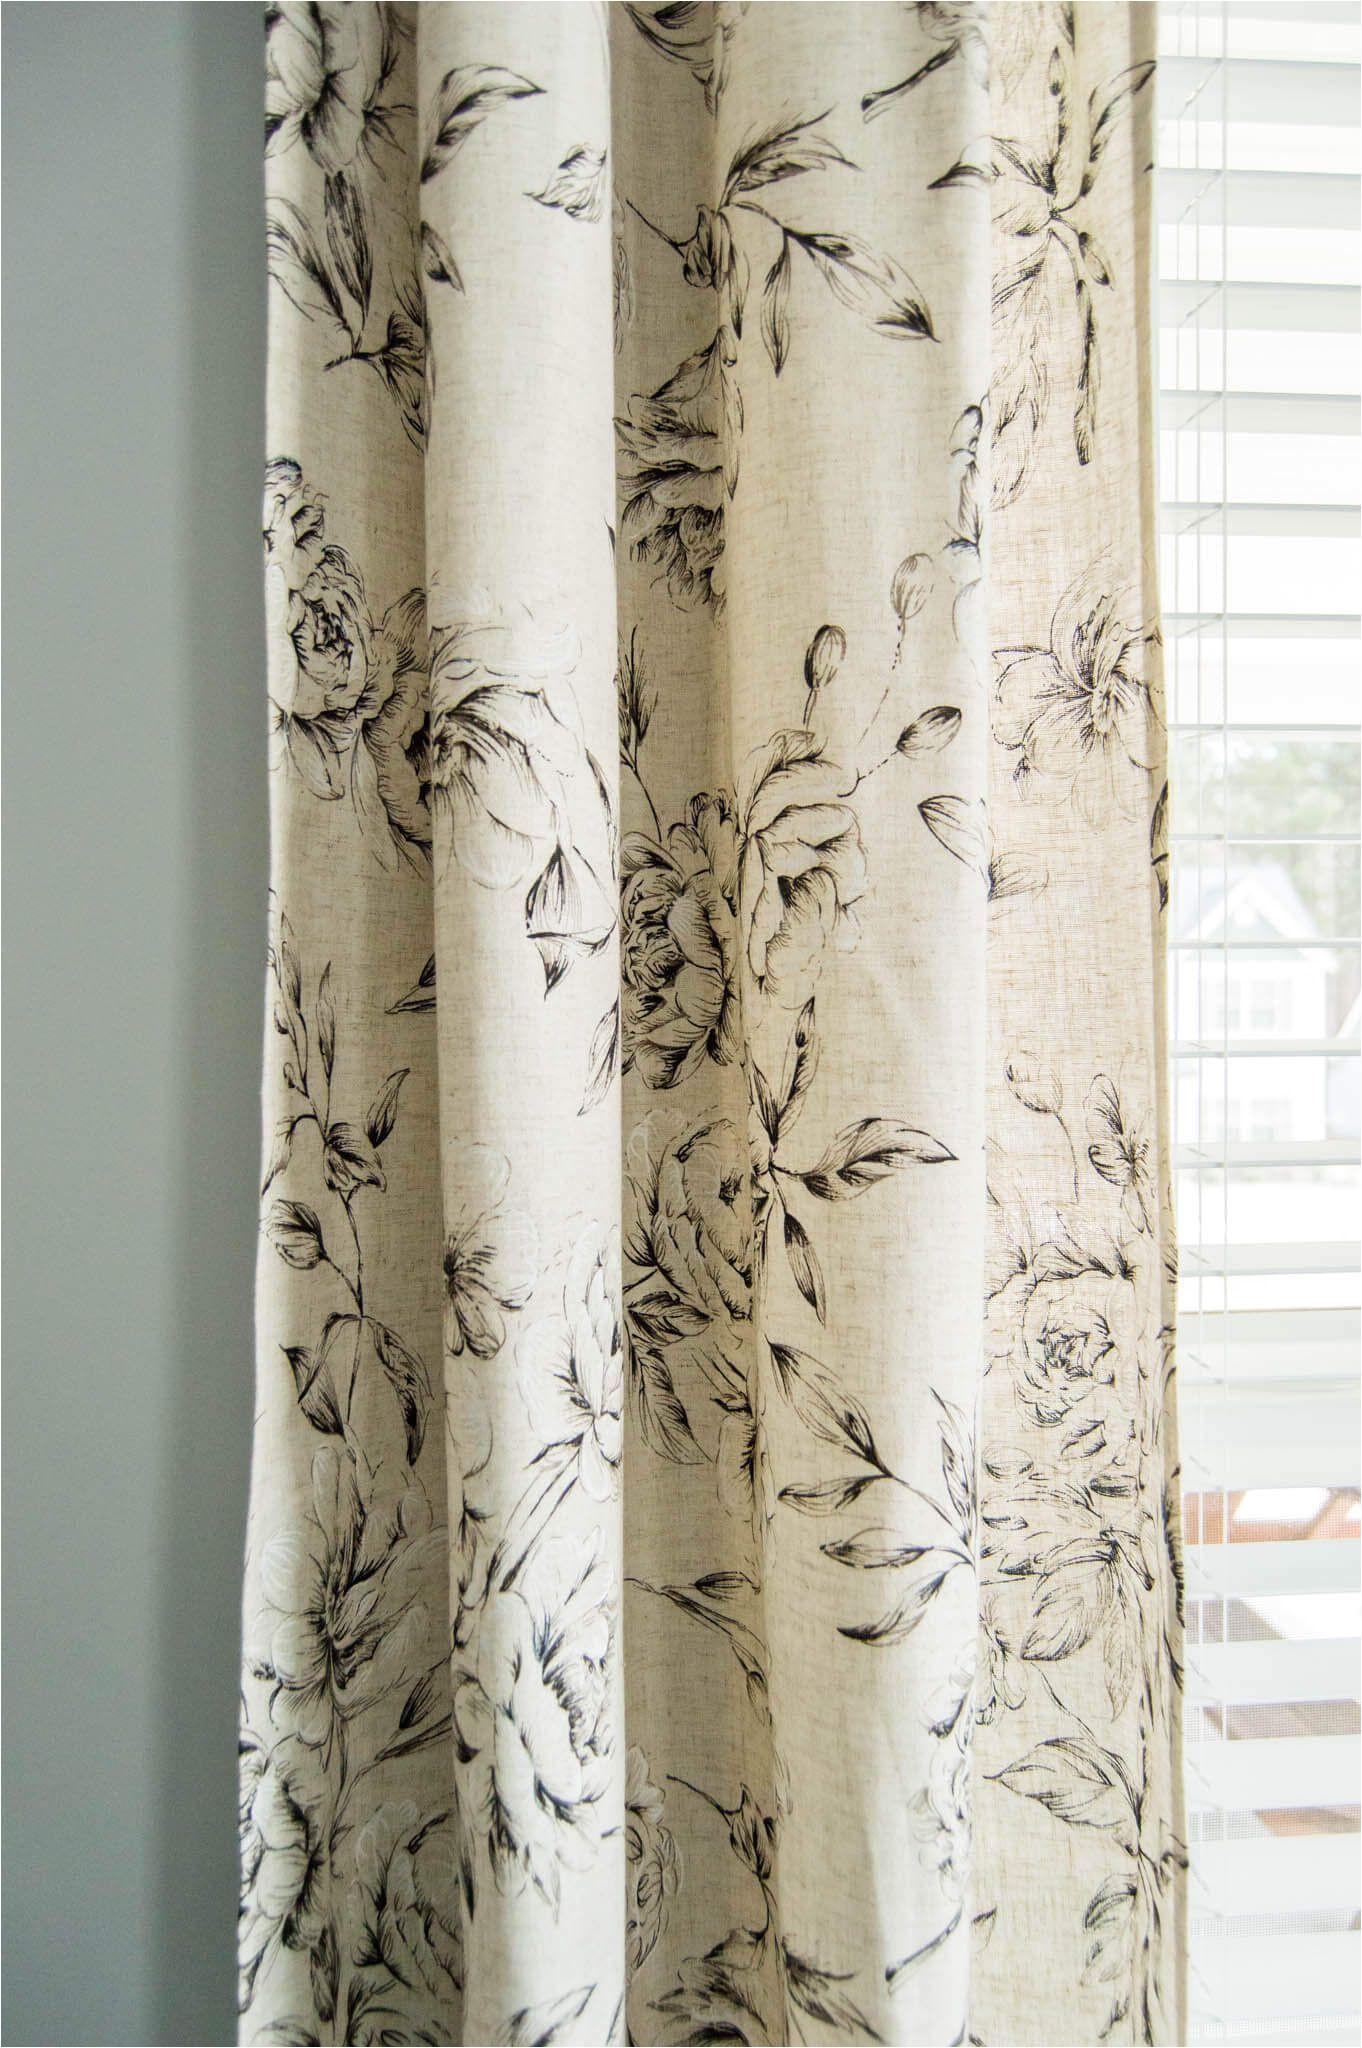 linen curtains minimalist bathroom curtains over tub faux burlap curtains light curtains dark walls